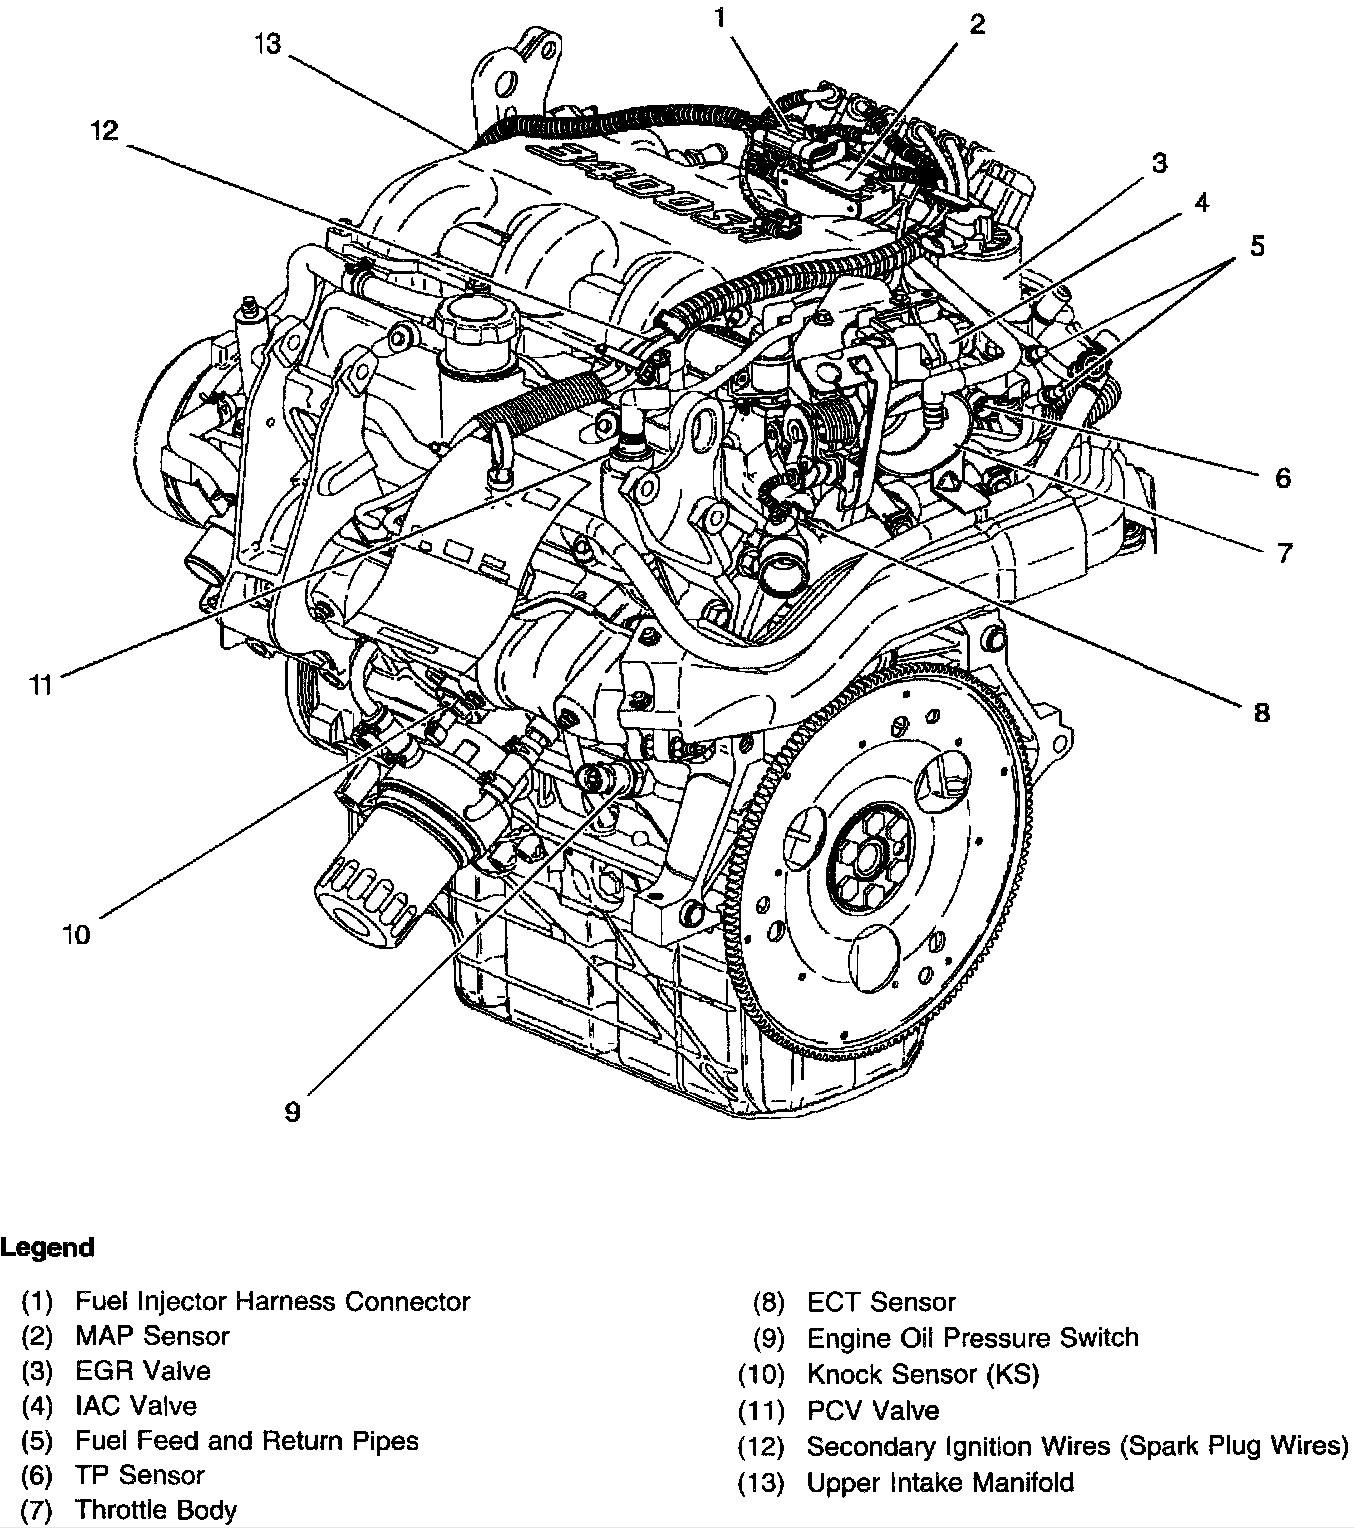 hight resolution of ford 3 0 v6 engine diagram b engine ign 09 spark plug wire